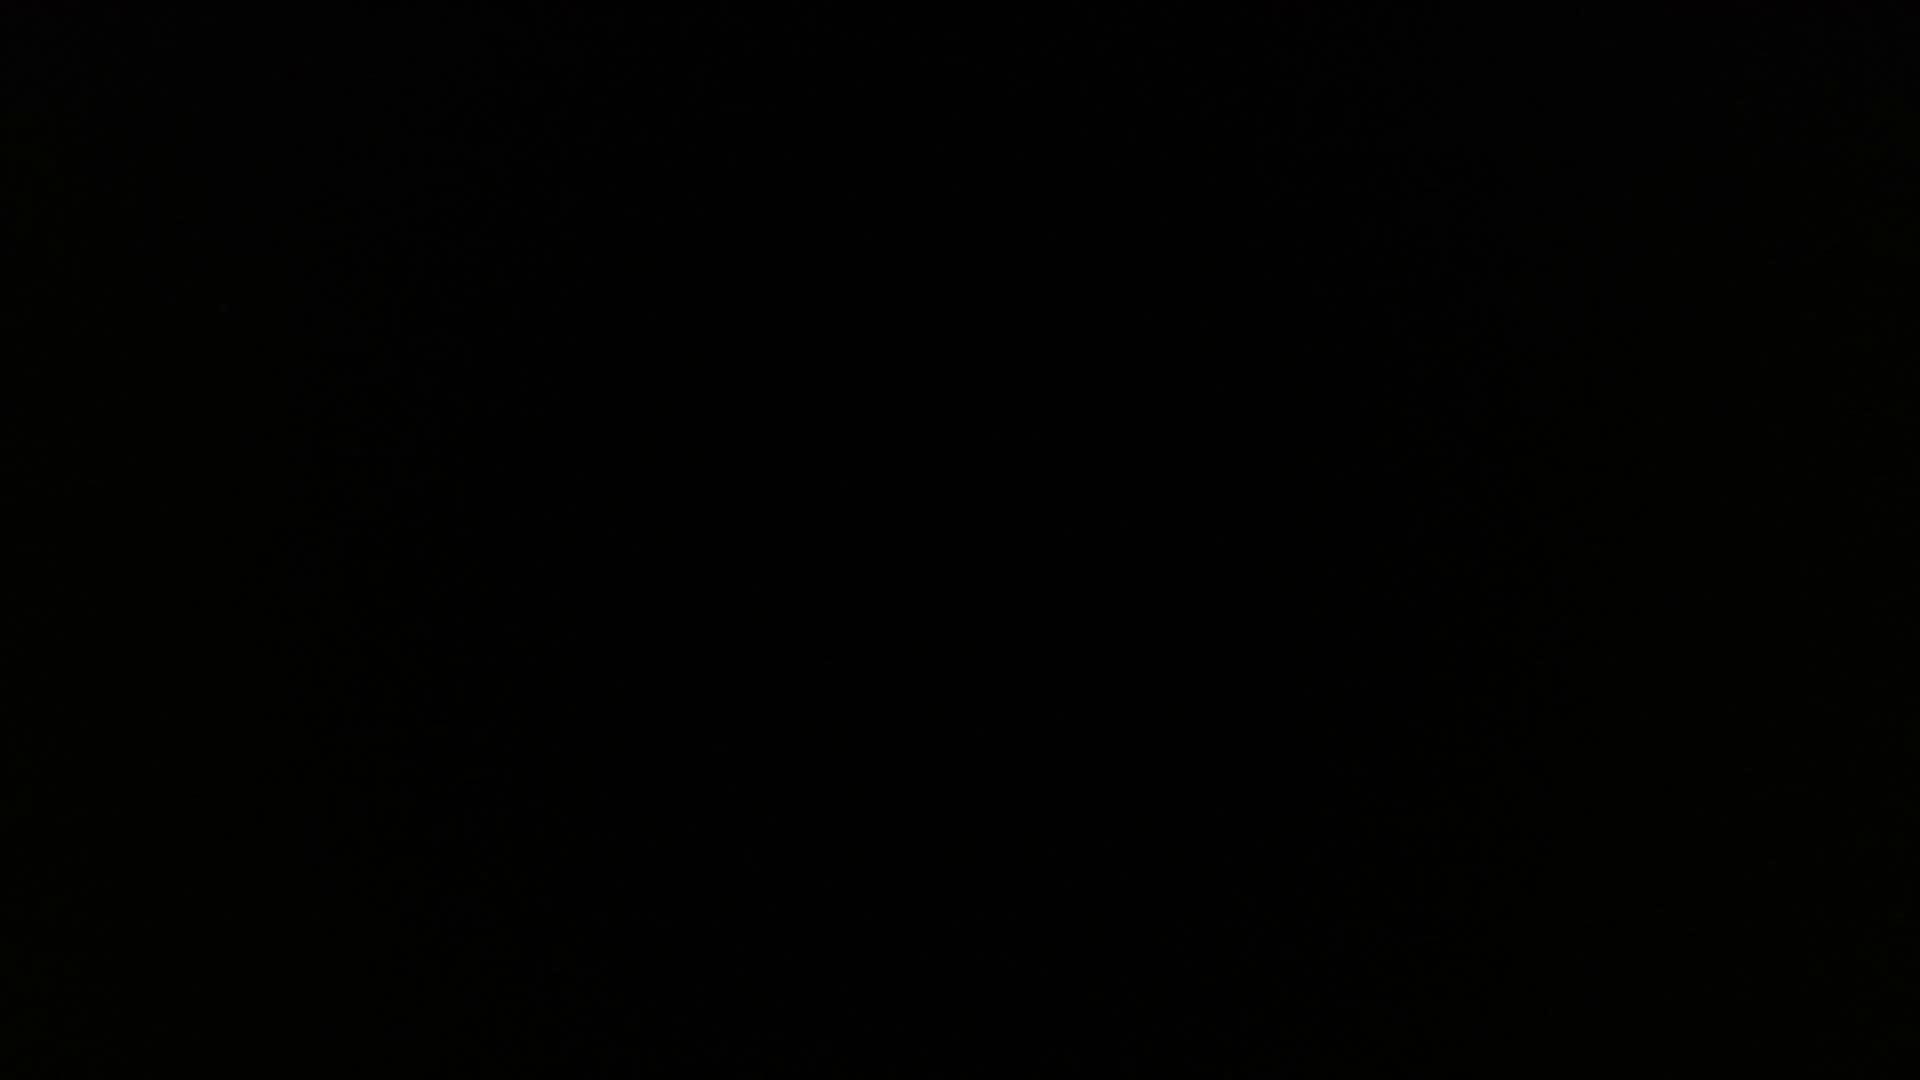 SPYさん初投稿!マンション覗き!5000K!ハイビジョン撮影VOL.03(元野球部社会人編) 完全無修正  109pic 54